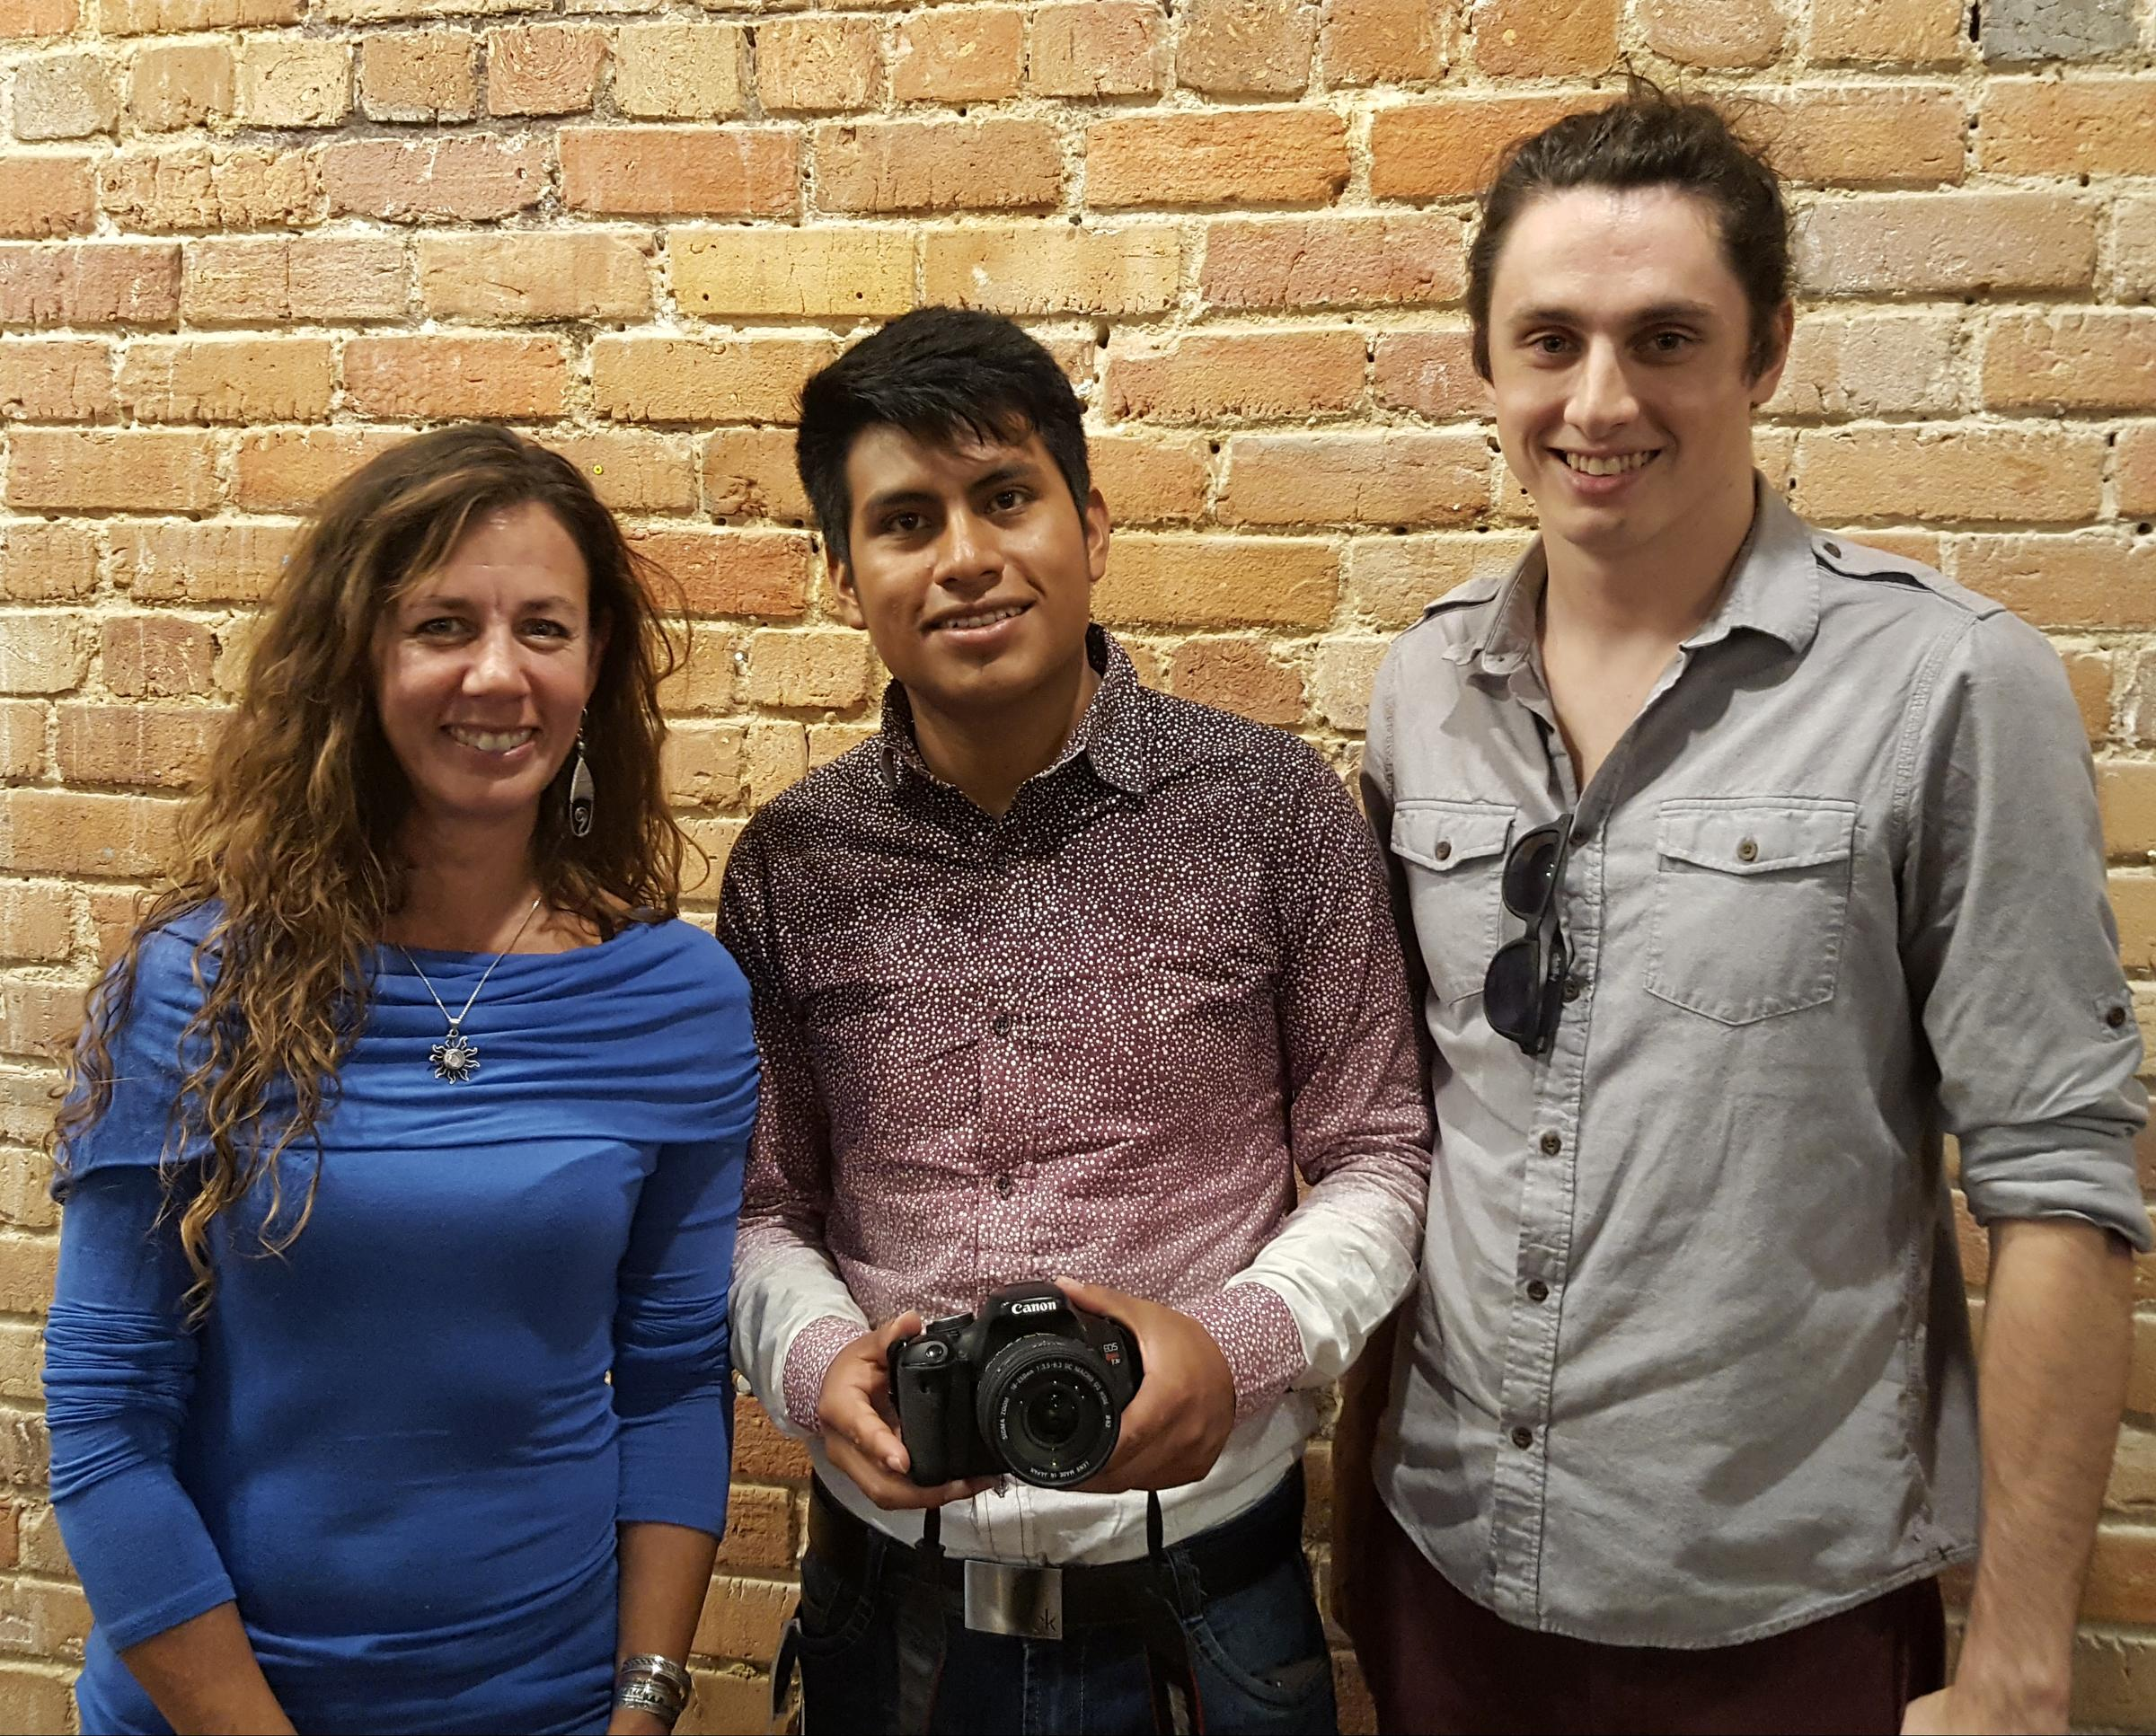 Communique: Meet Mayan & Lumbee Youth Documentarians | Sunday @ Art